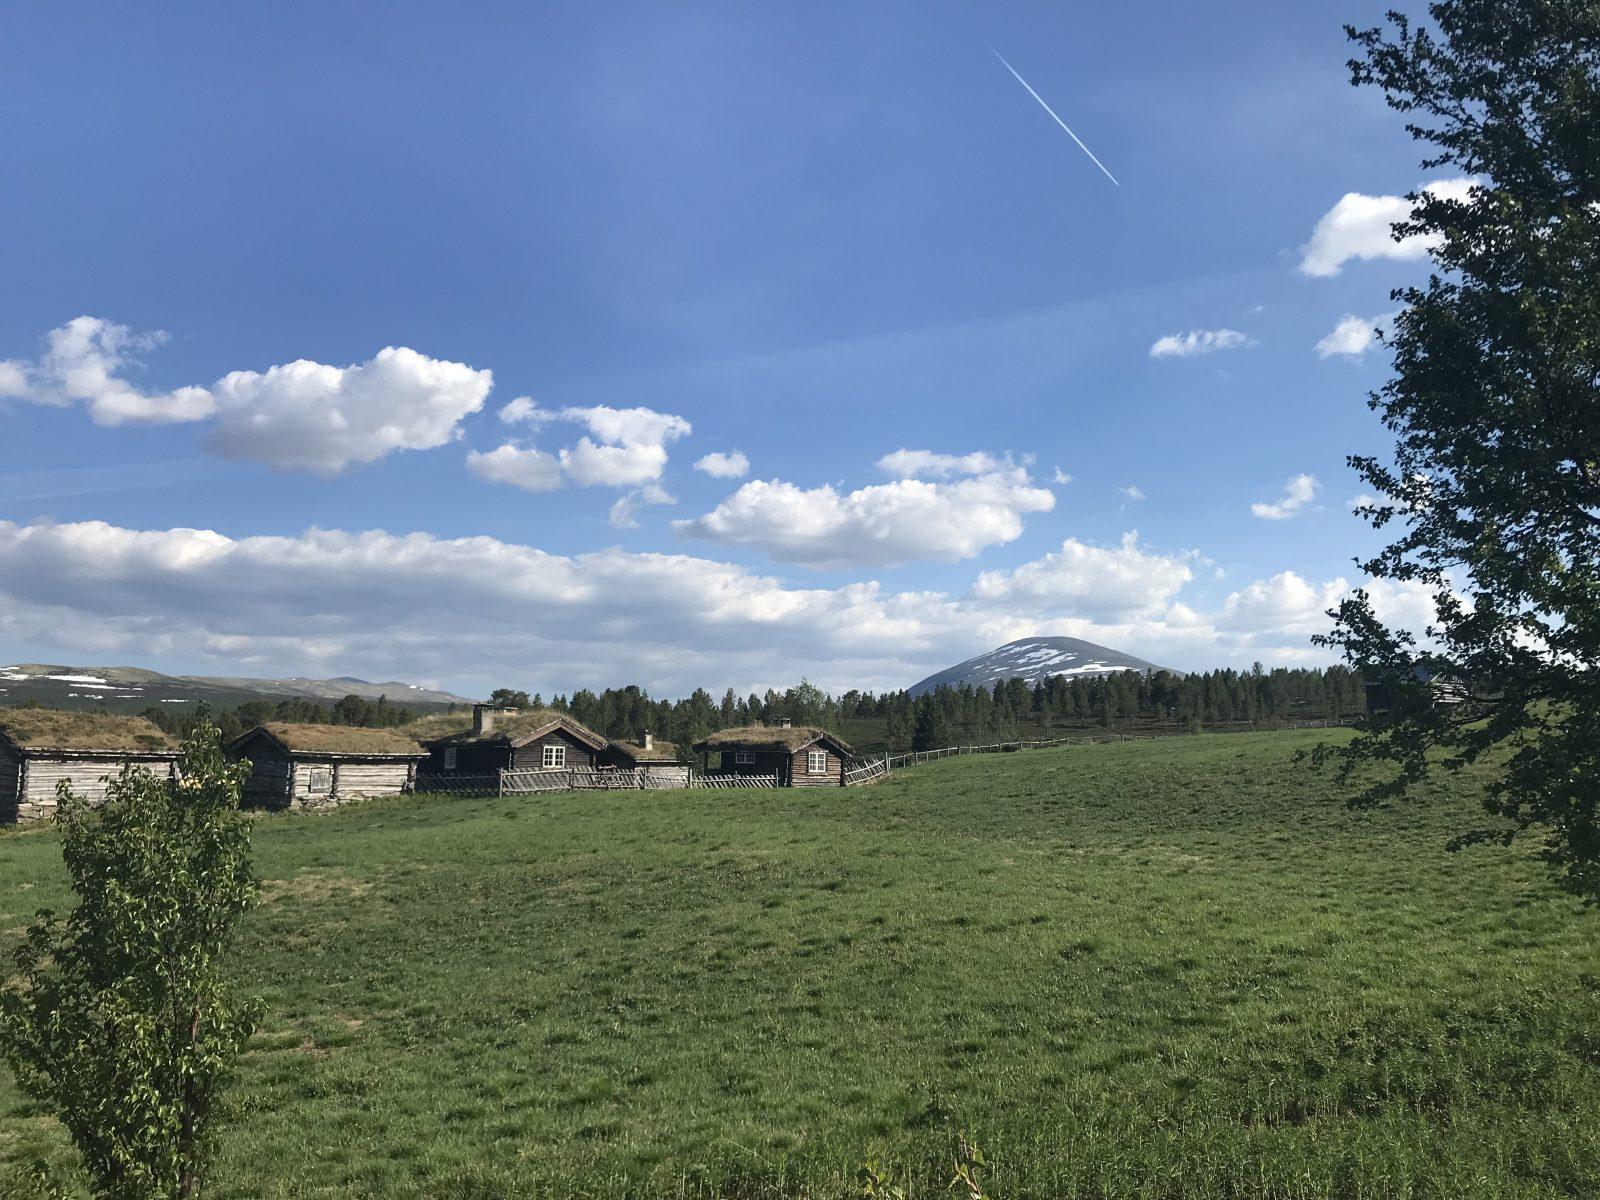 Seteridyll på kvernbru, Heidalsmuen i bakgrunnen